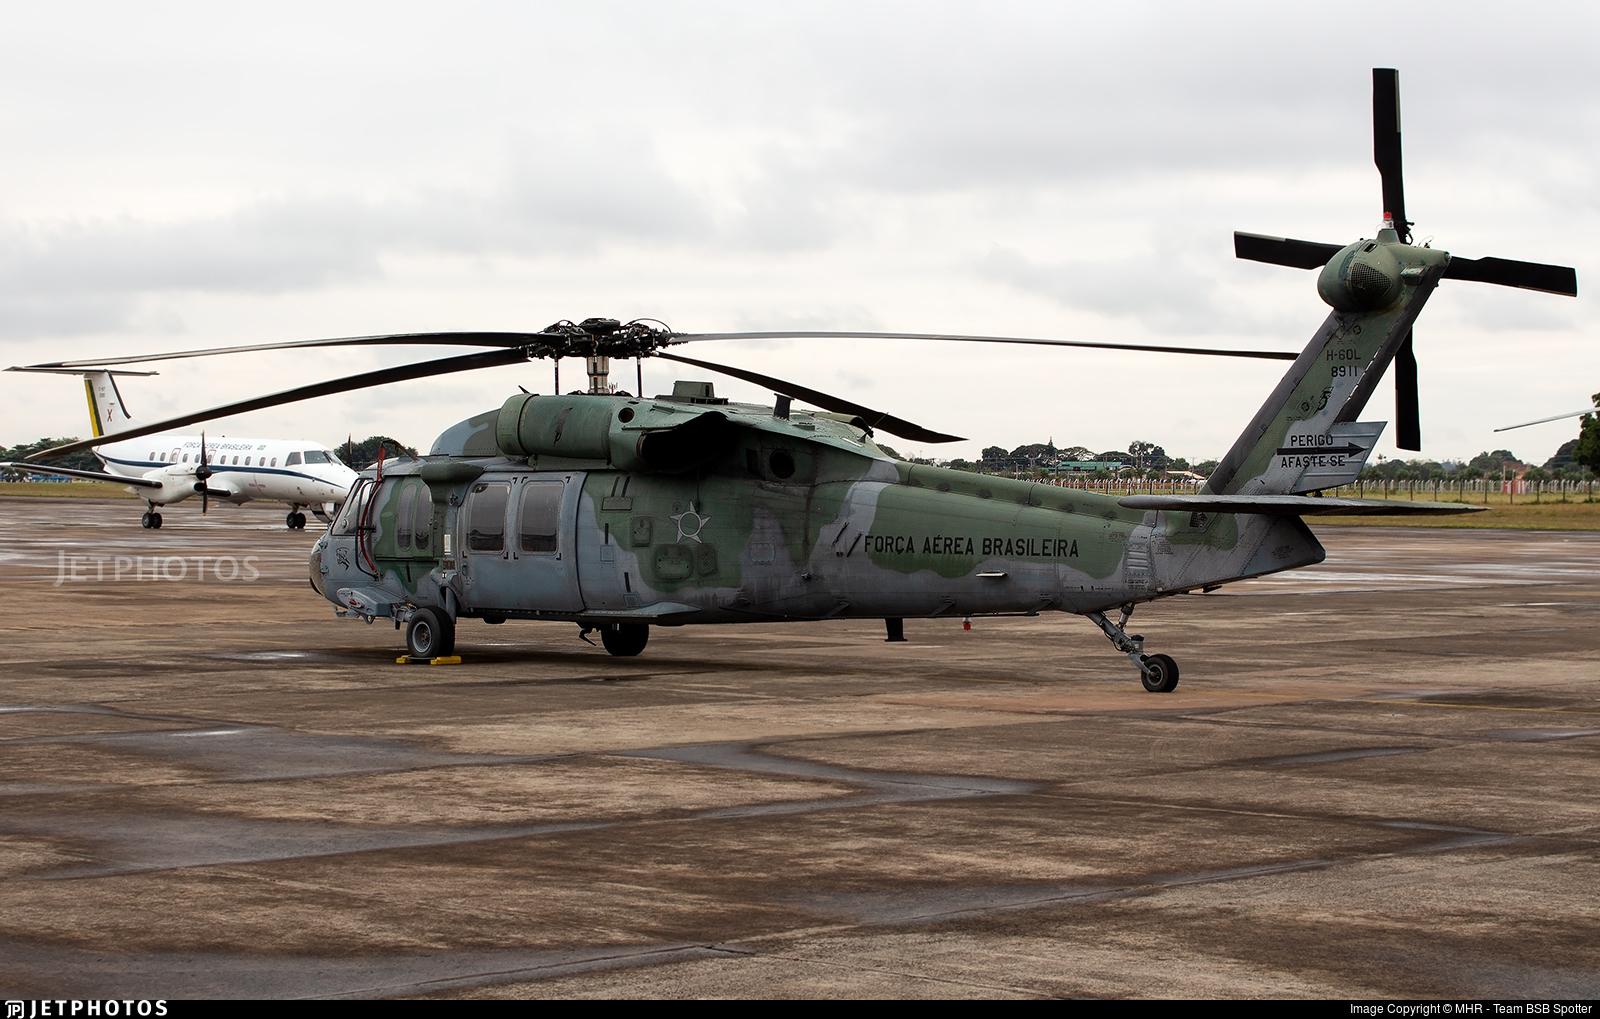 FAB8911 - Sikorsky H-60L Blackhawk - Brazil - Air Force